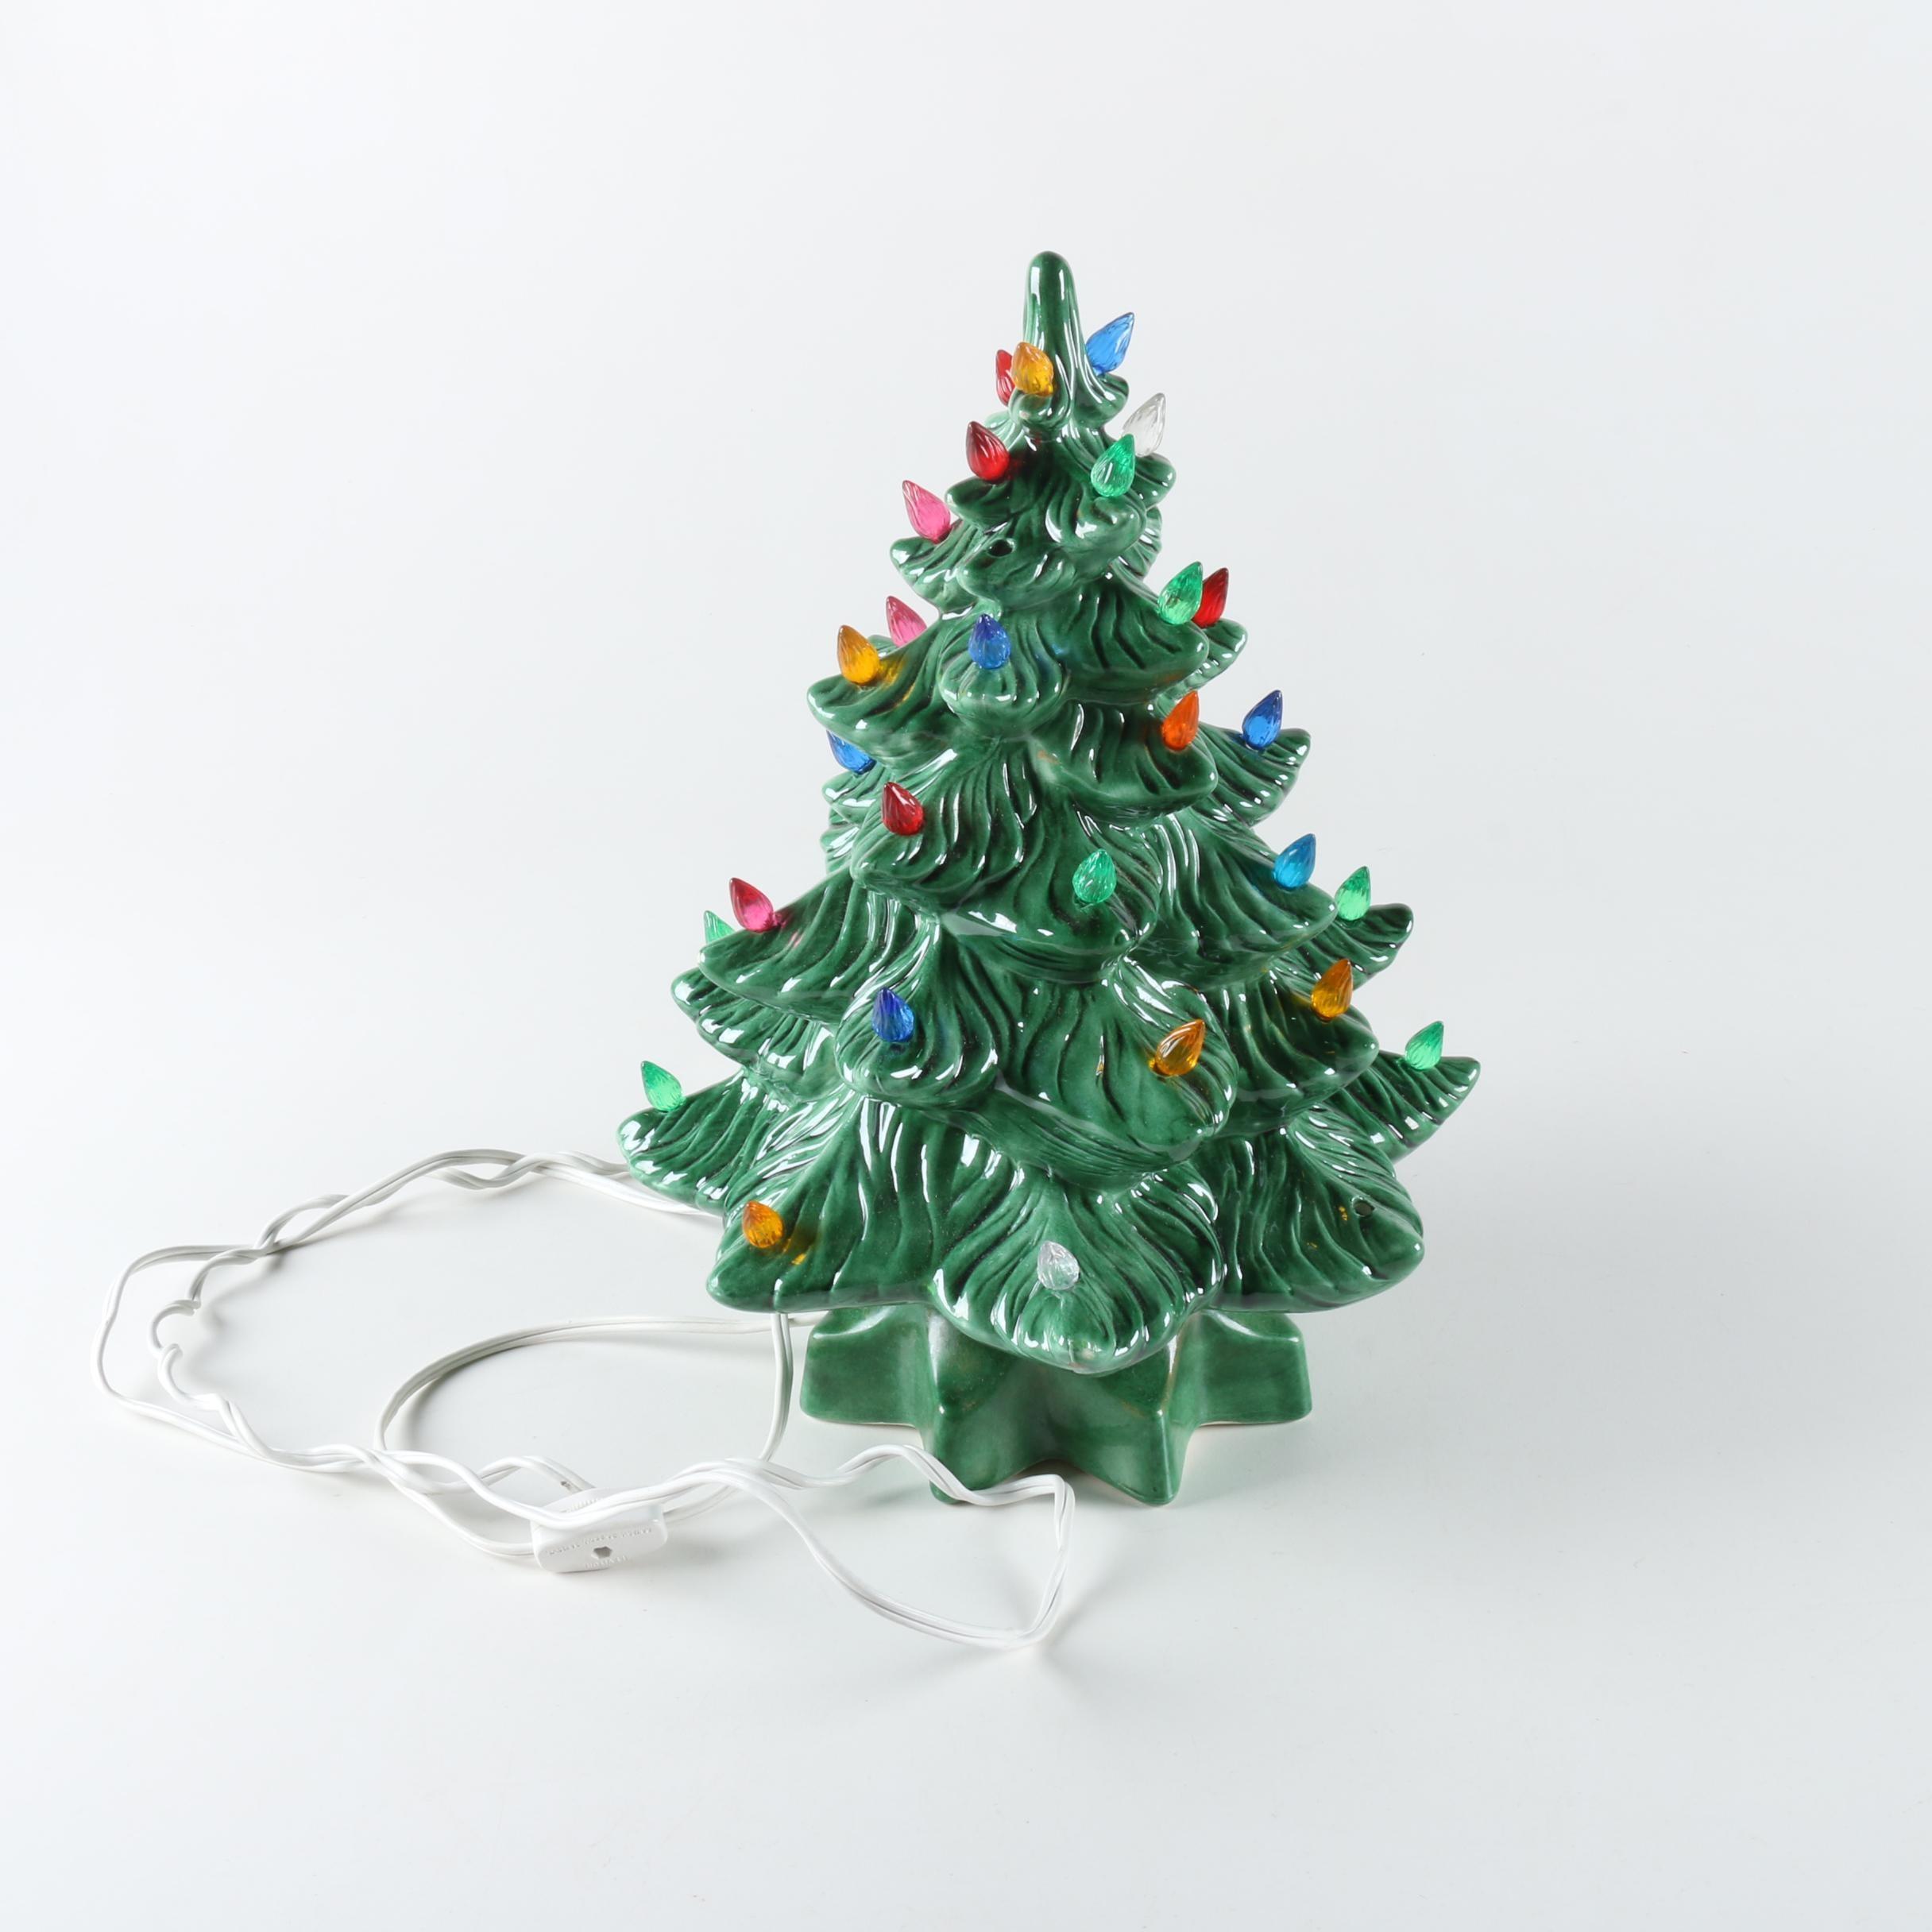 Lighted Christmas Tree Decor Piece